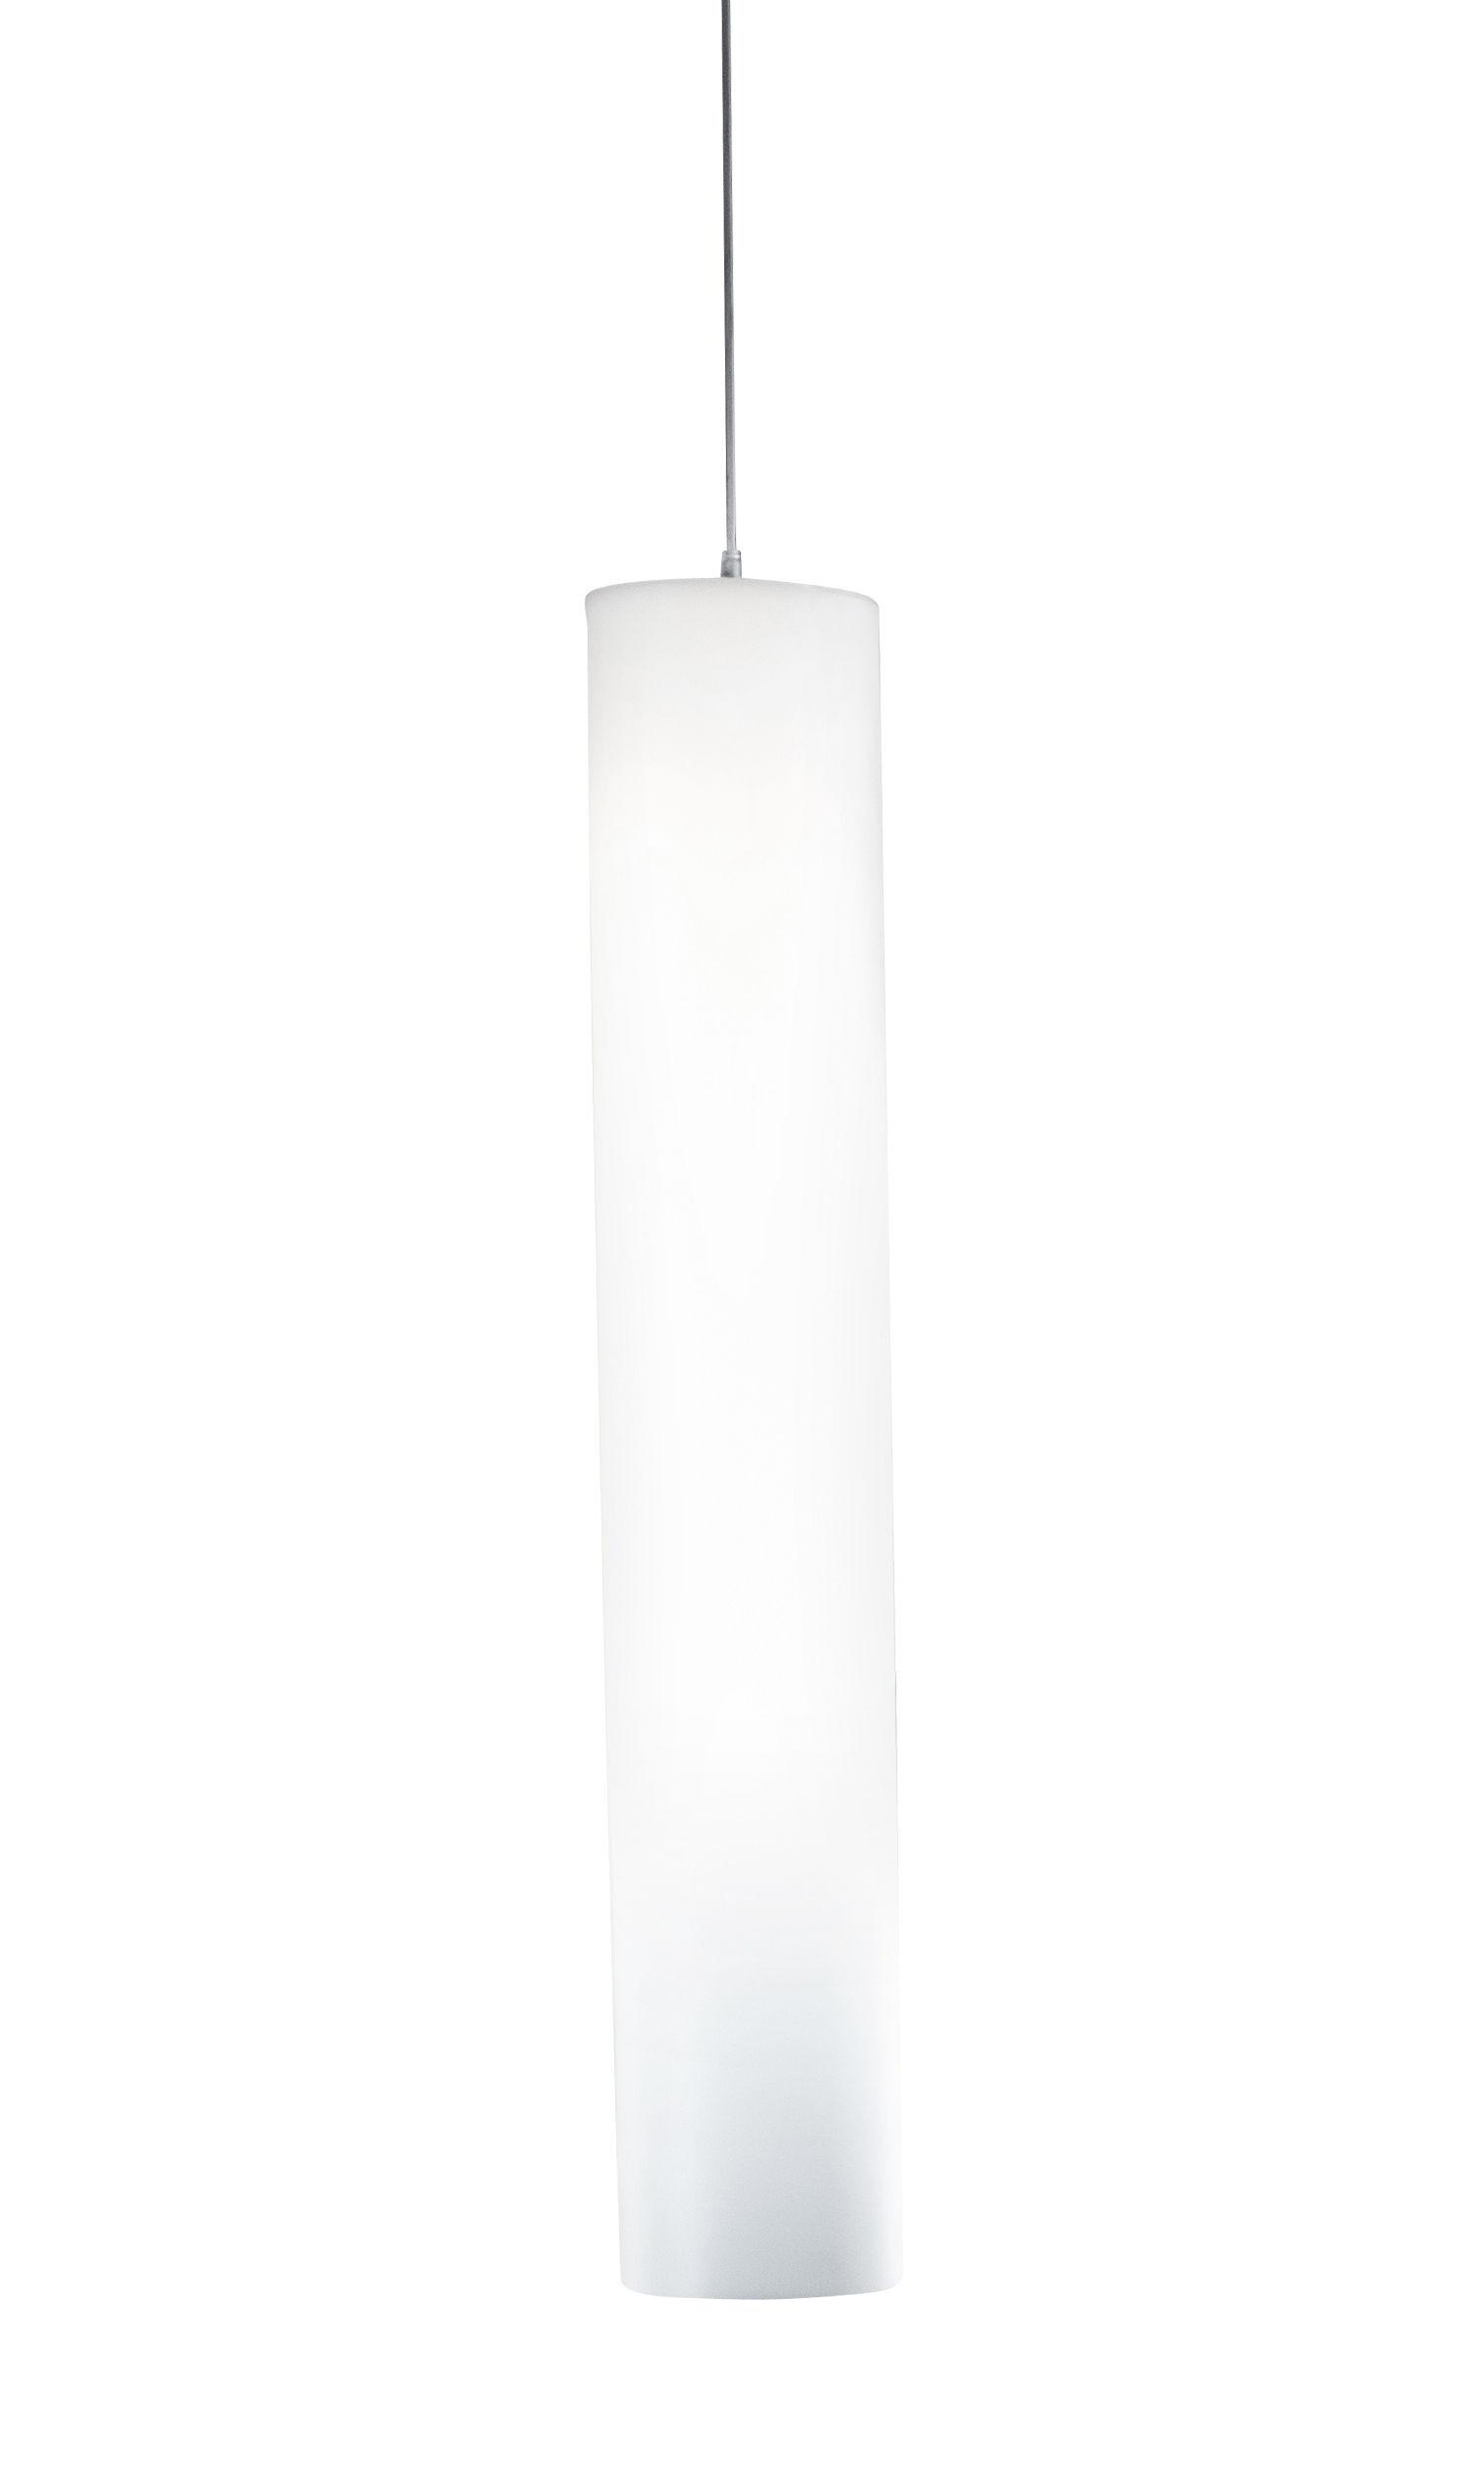 Lighting - Pendant Lighting - Tubo Large Pendant - H 110 cm by Stamp Edition - Large / Translucent white - Metal, Polypropylene